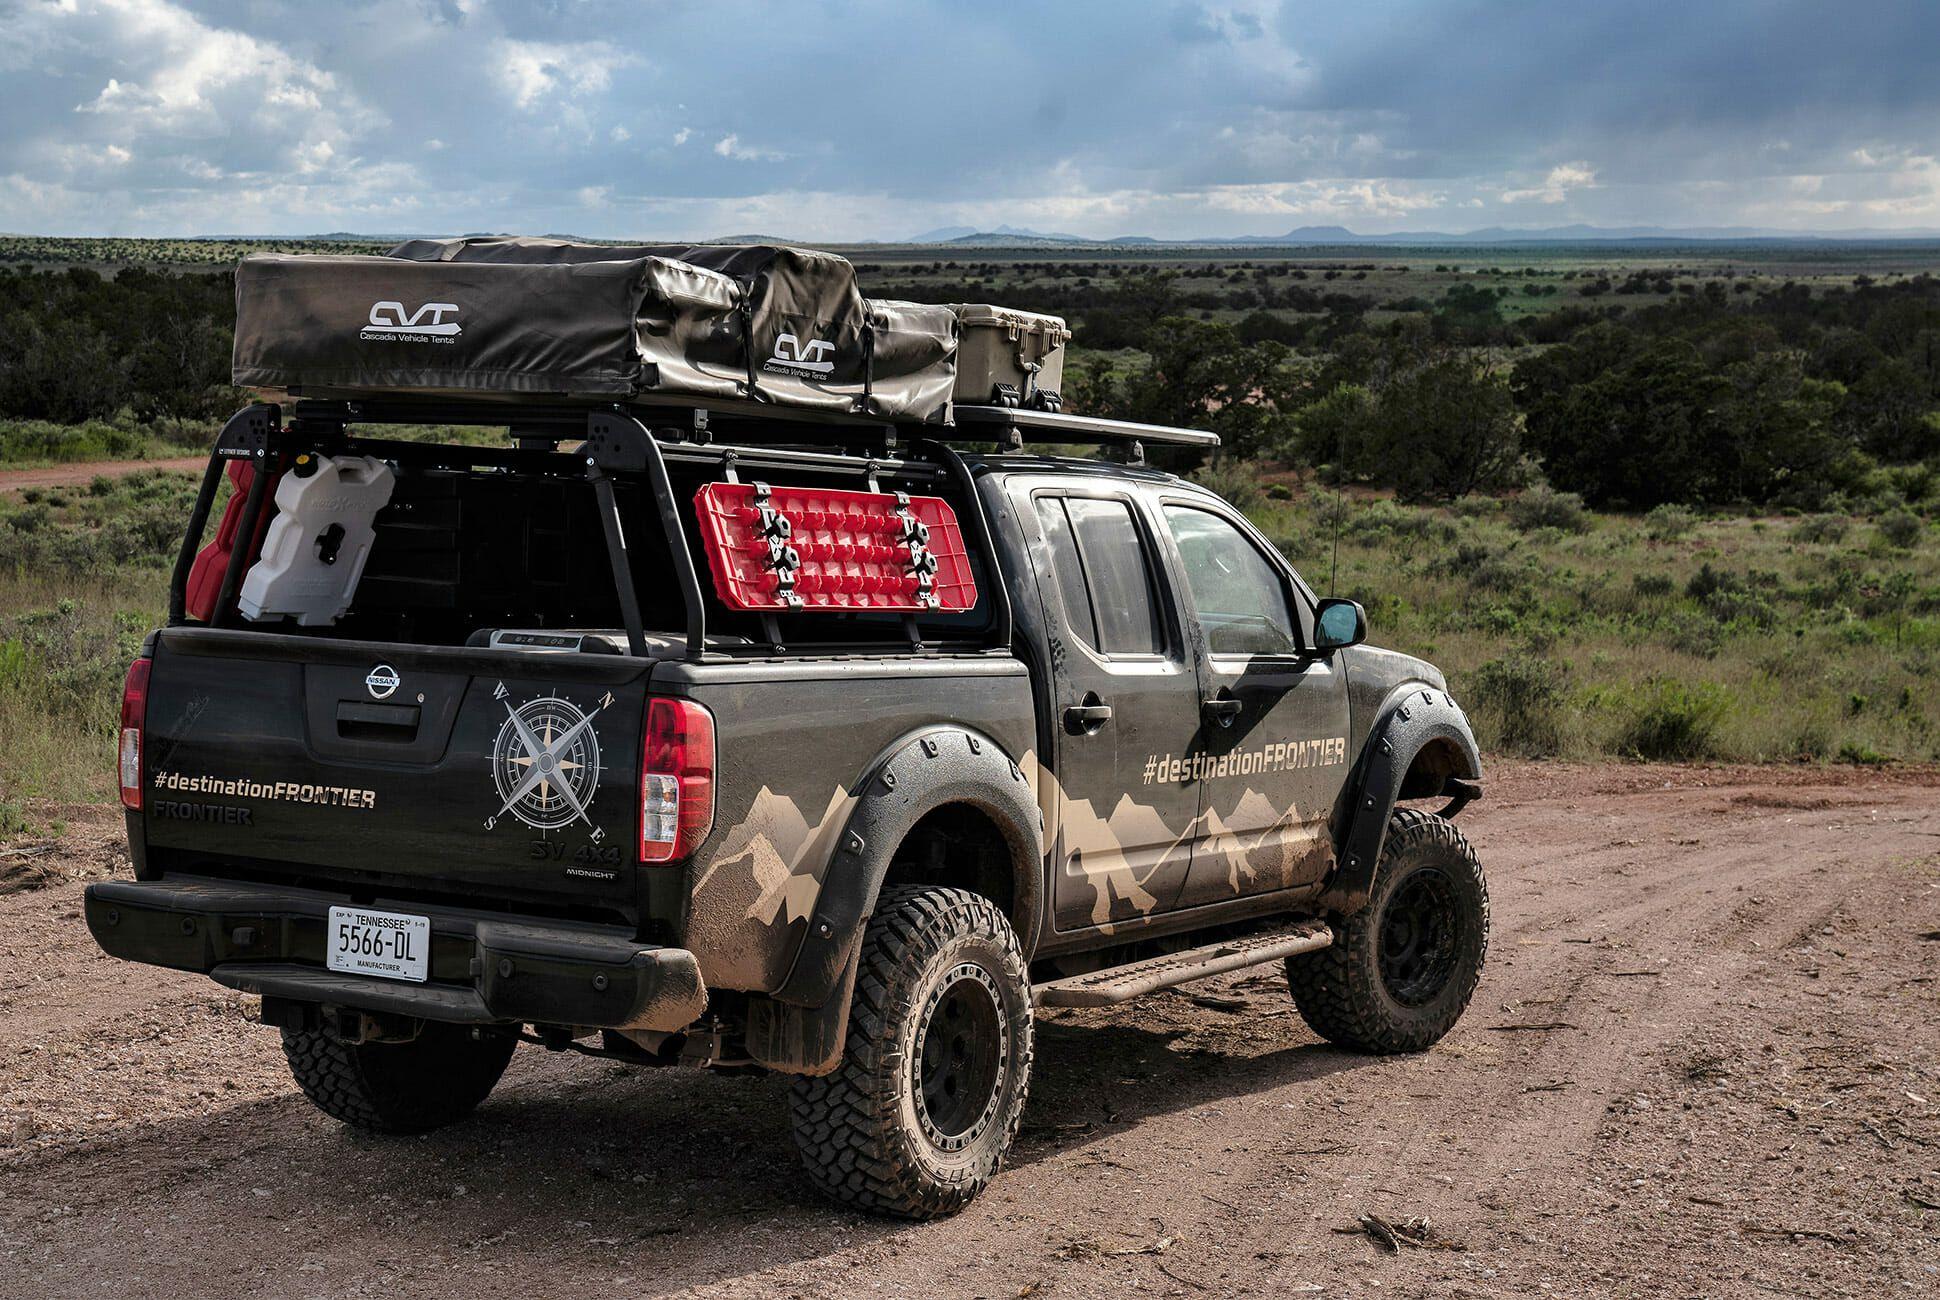 Nissan-Destination-Frontier-gear-patrol-slide-1